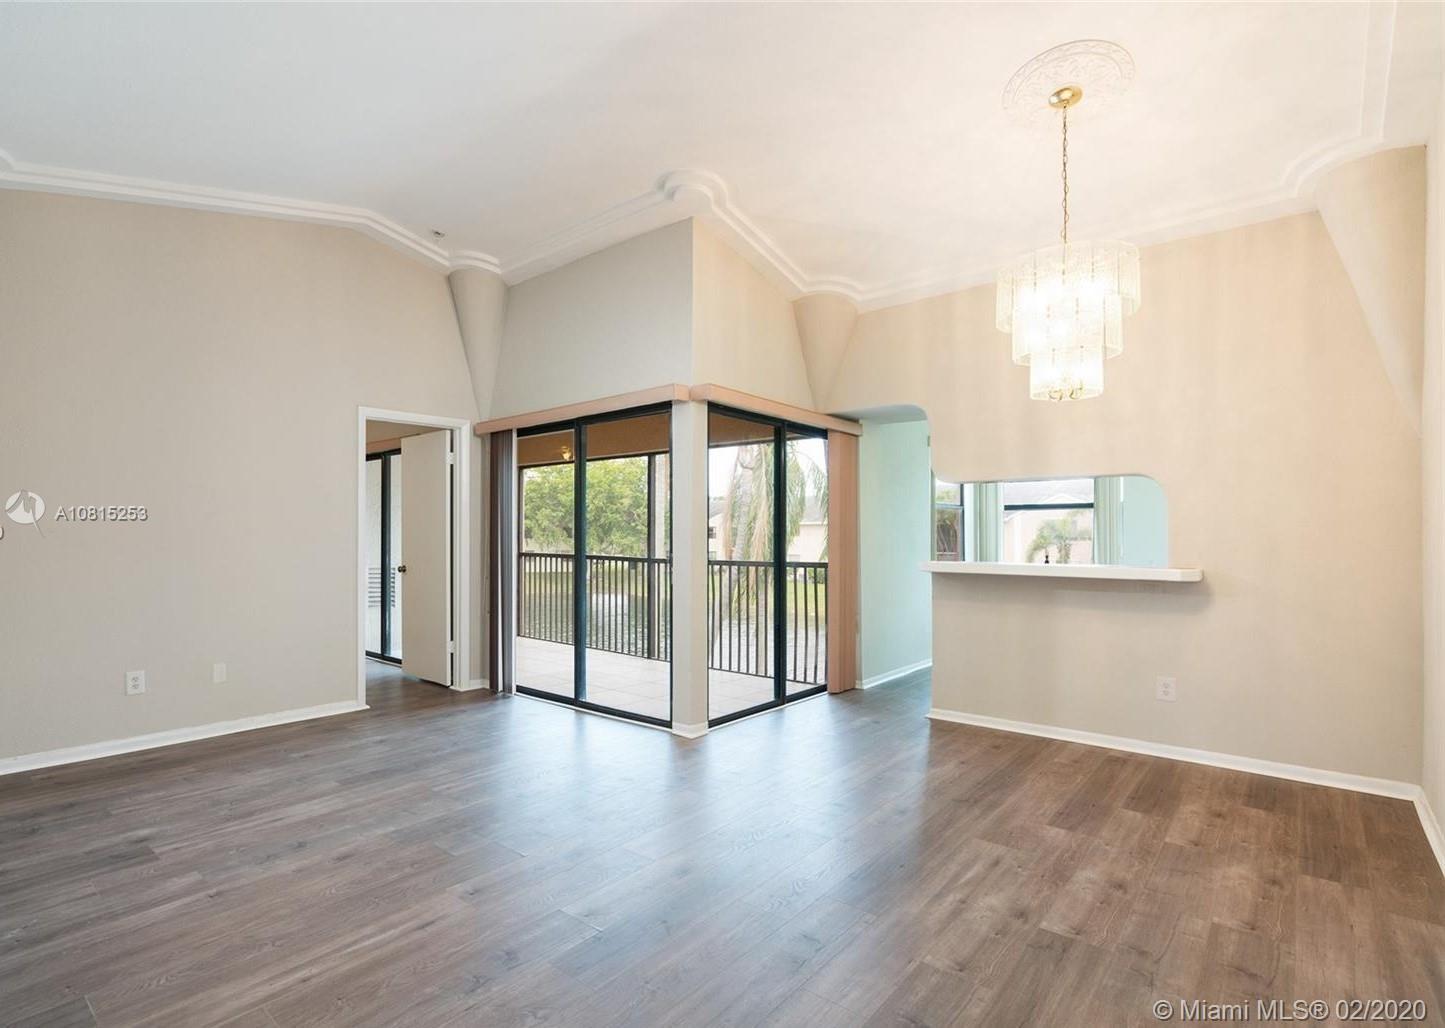 1160 Washington Cir #1160E, Homestead, FL 33034 - Homestead, FL real estate listing